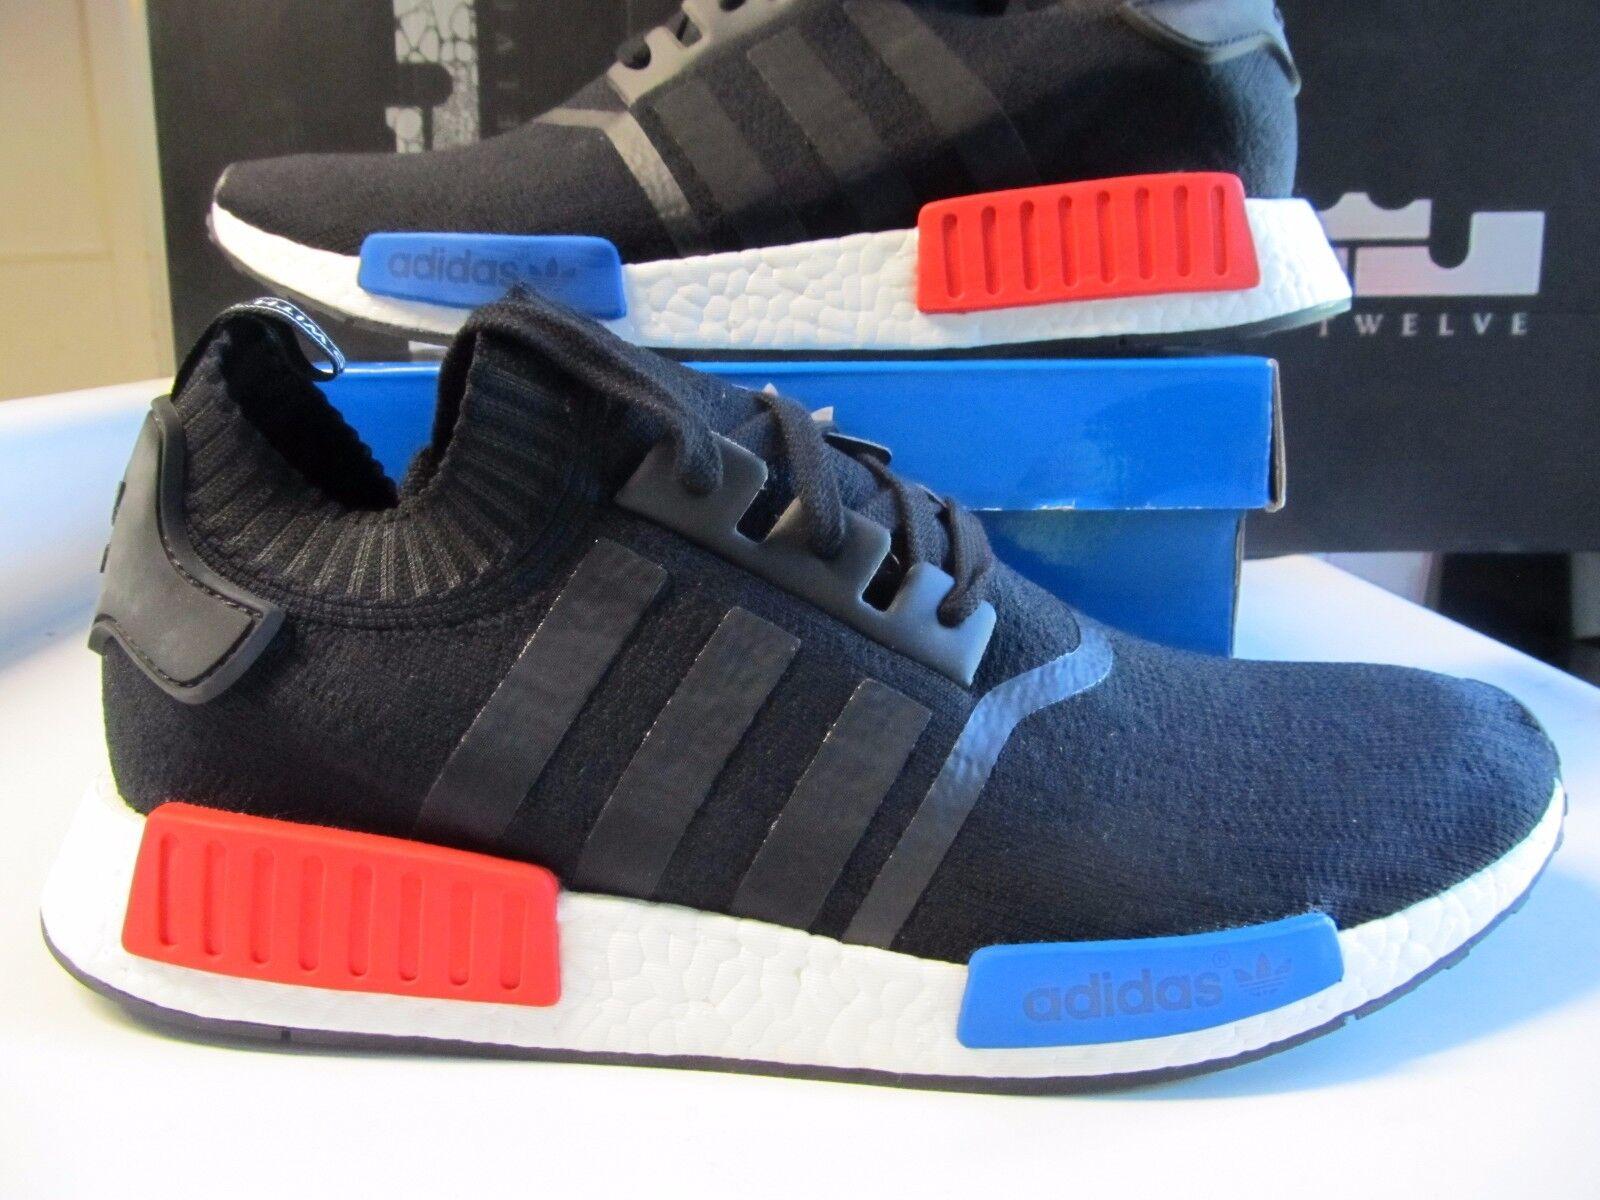 Adidas NMD R1 Runner PK primeknit Core negro ultra rojo azul OG s79168 ultra negro Boost 51097f